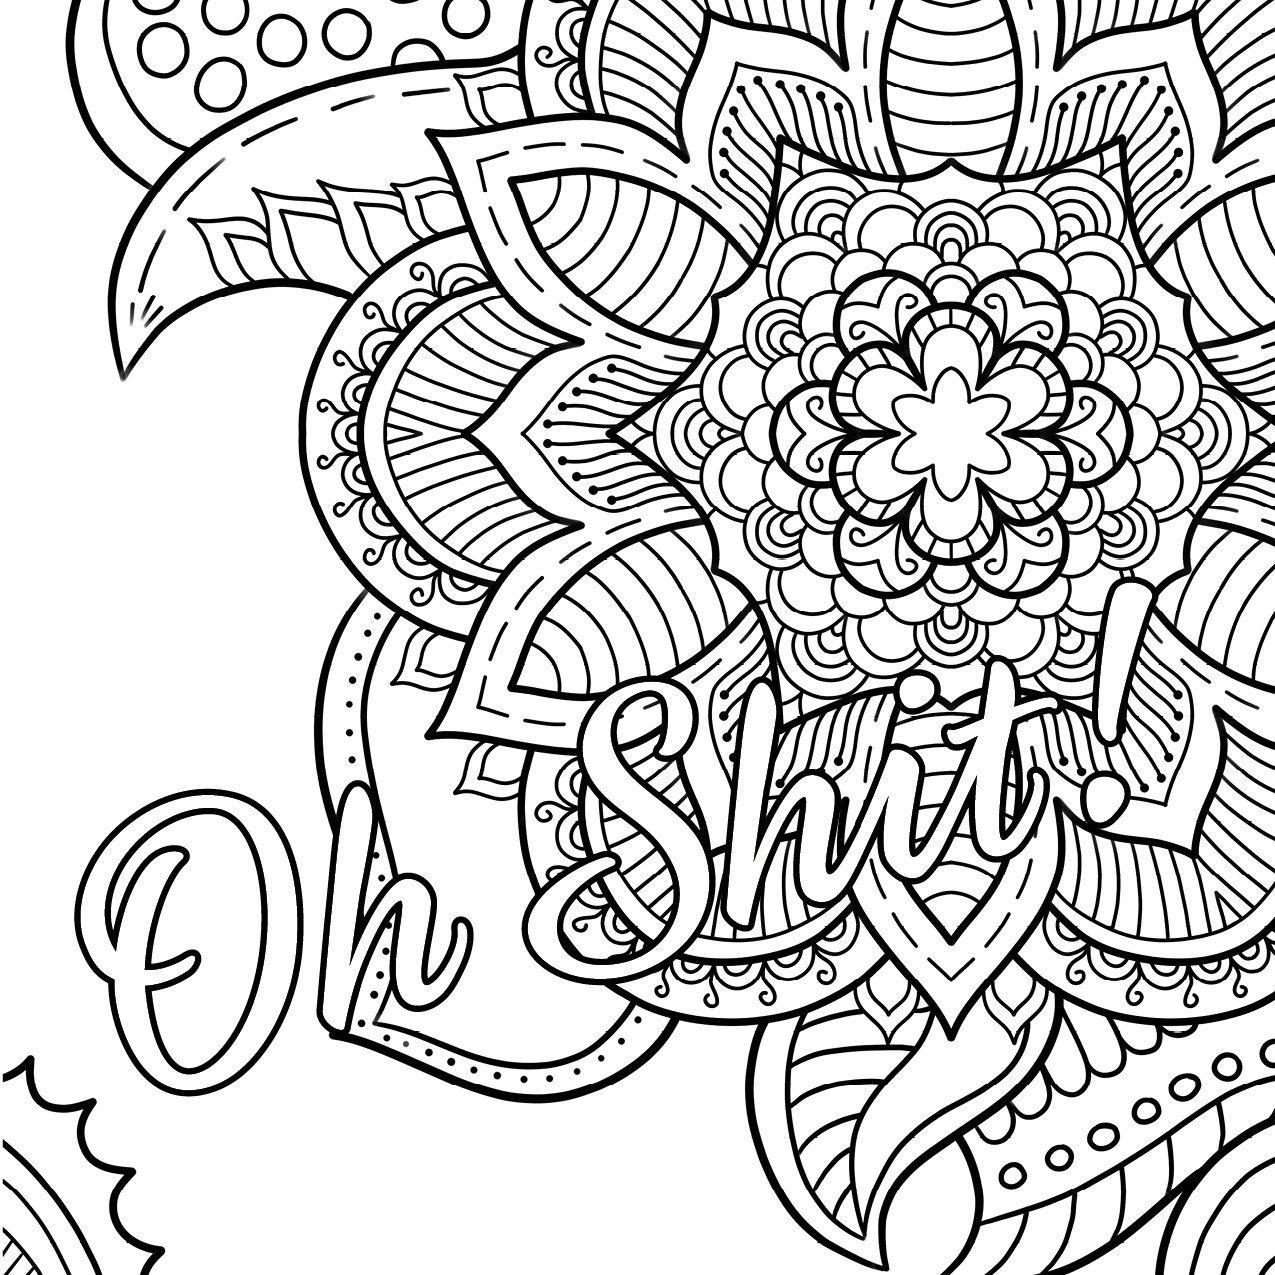 Swear Word Coloring Book #2 Free Printable Coloring Pages For Adults - Free Printable Coloring Pages For Adults Only Swear Words